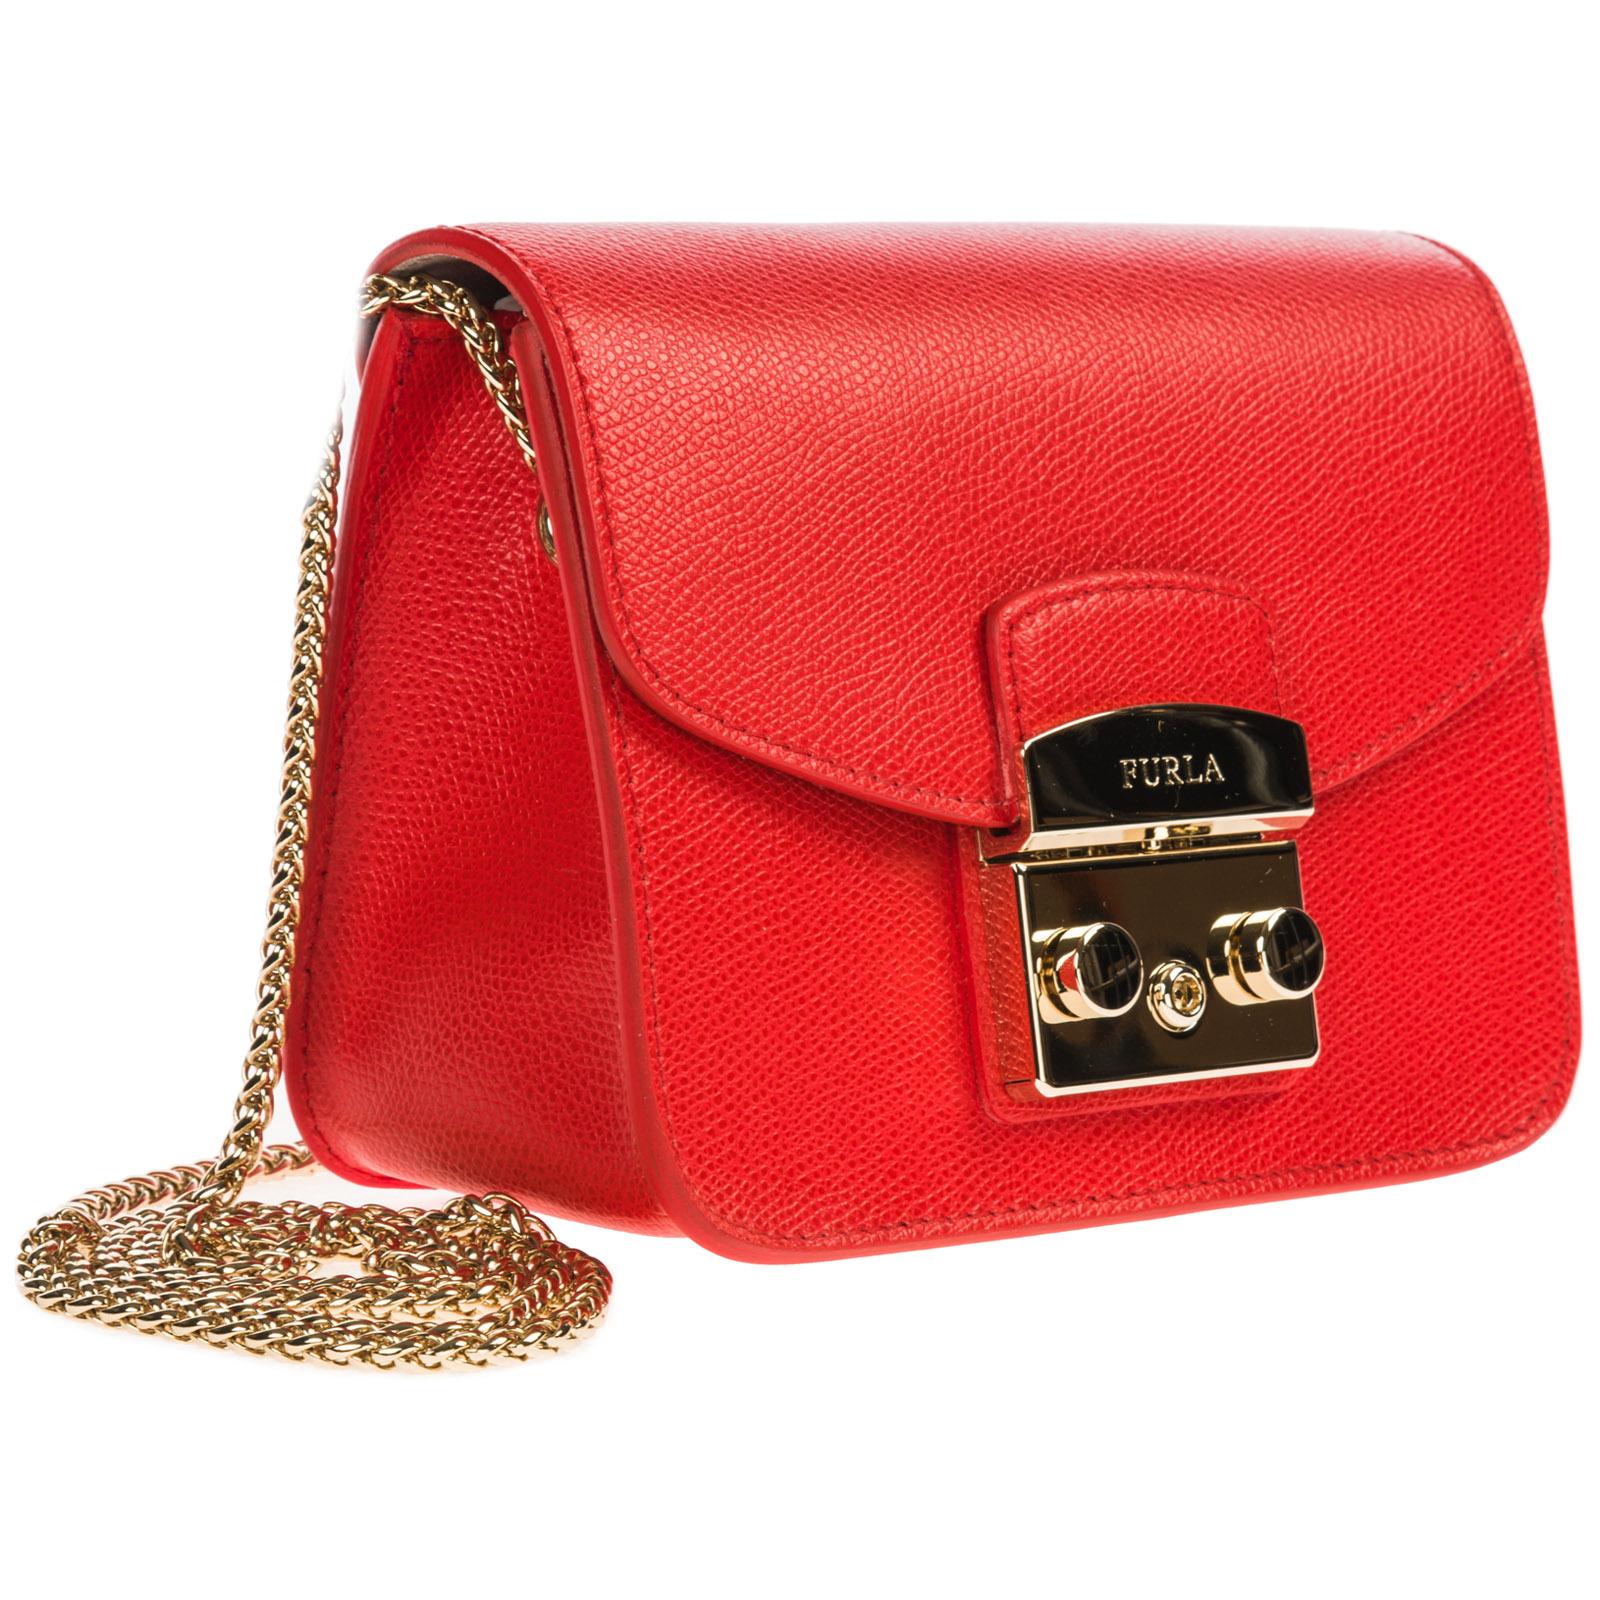 9f54098dfb2ed3 Furla Women's leather cross-body messenger shoulder bag metropolis